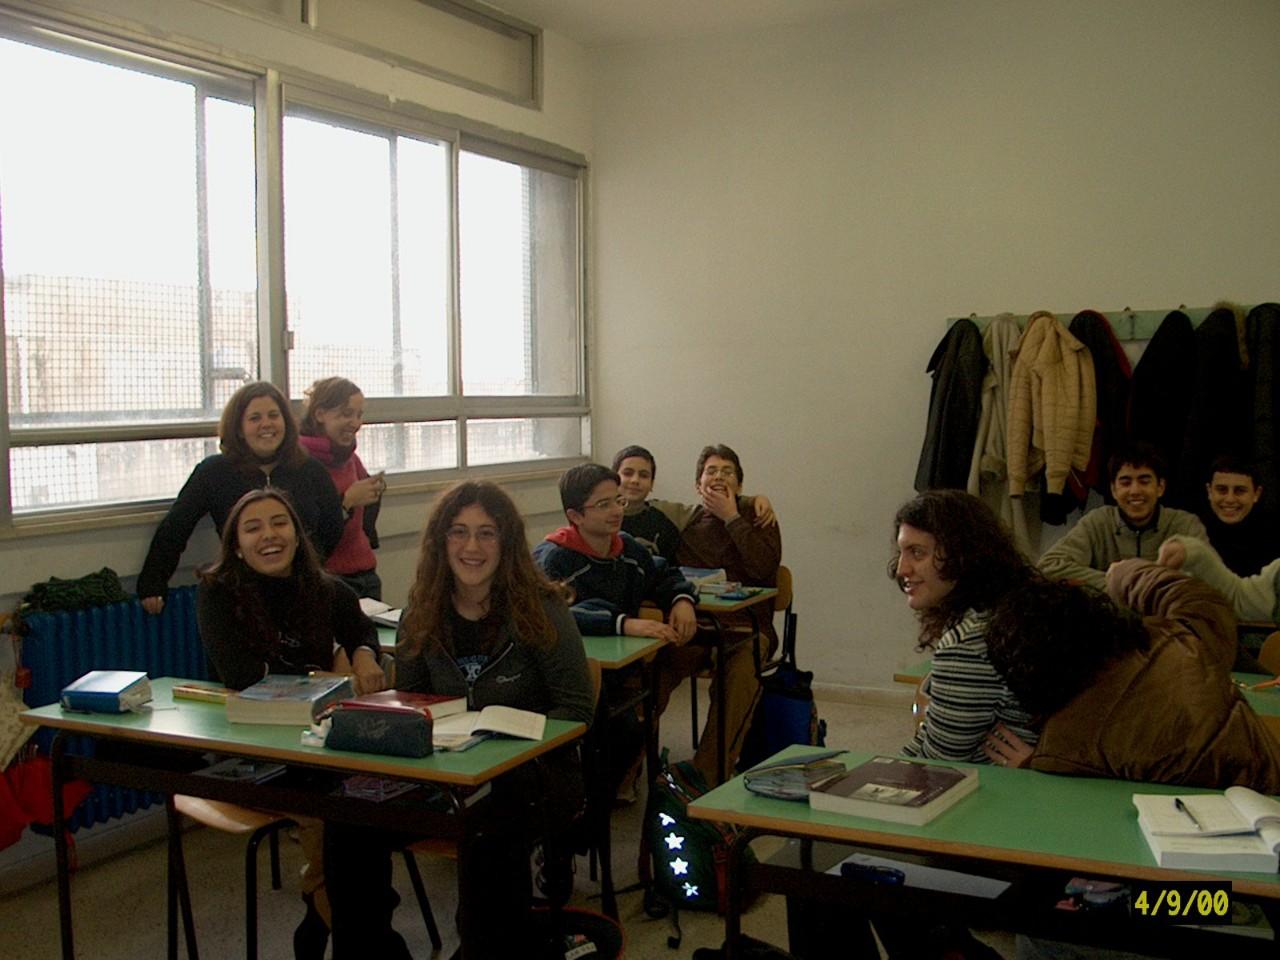 de Sanctis 2003 studenti (7)